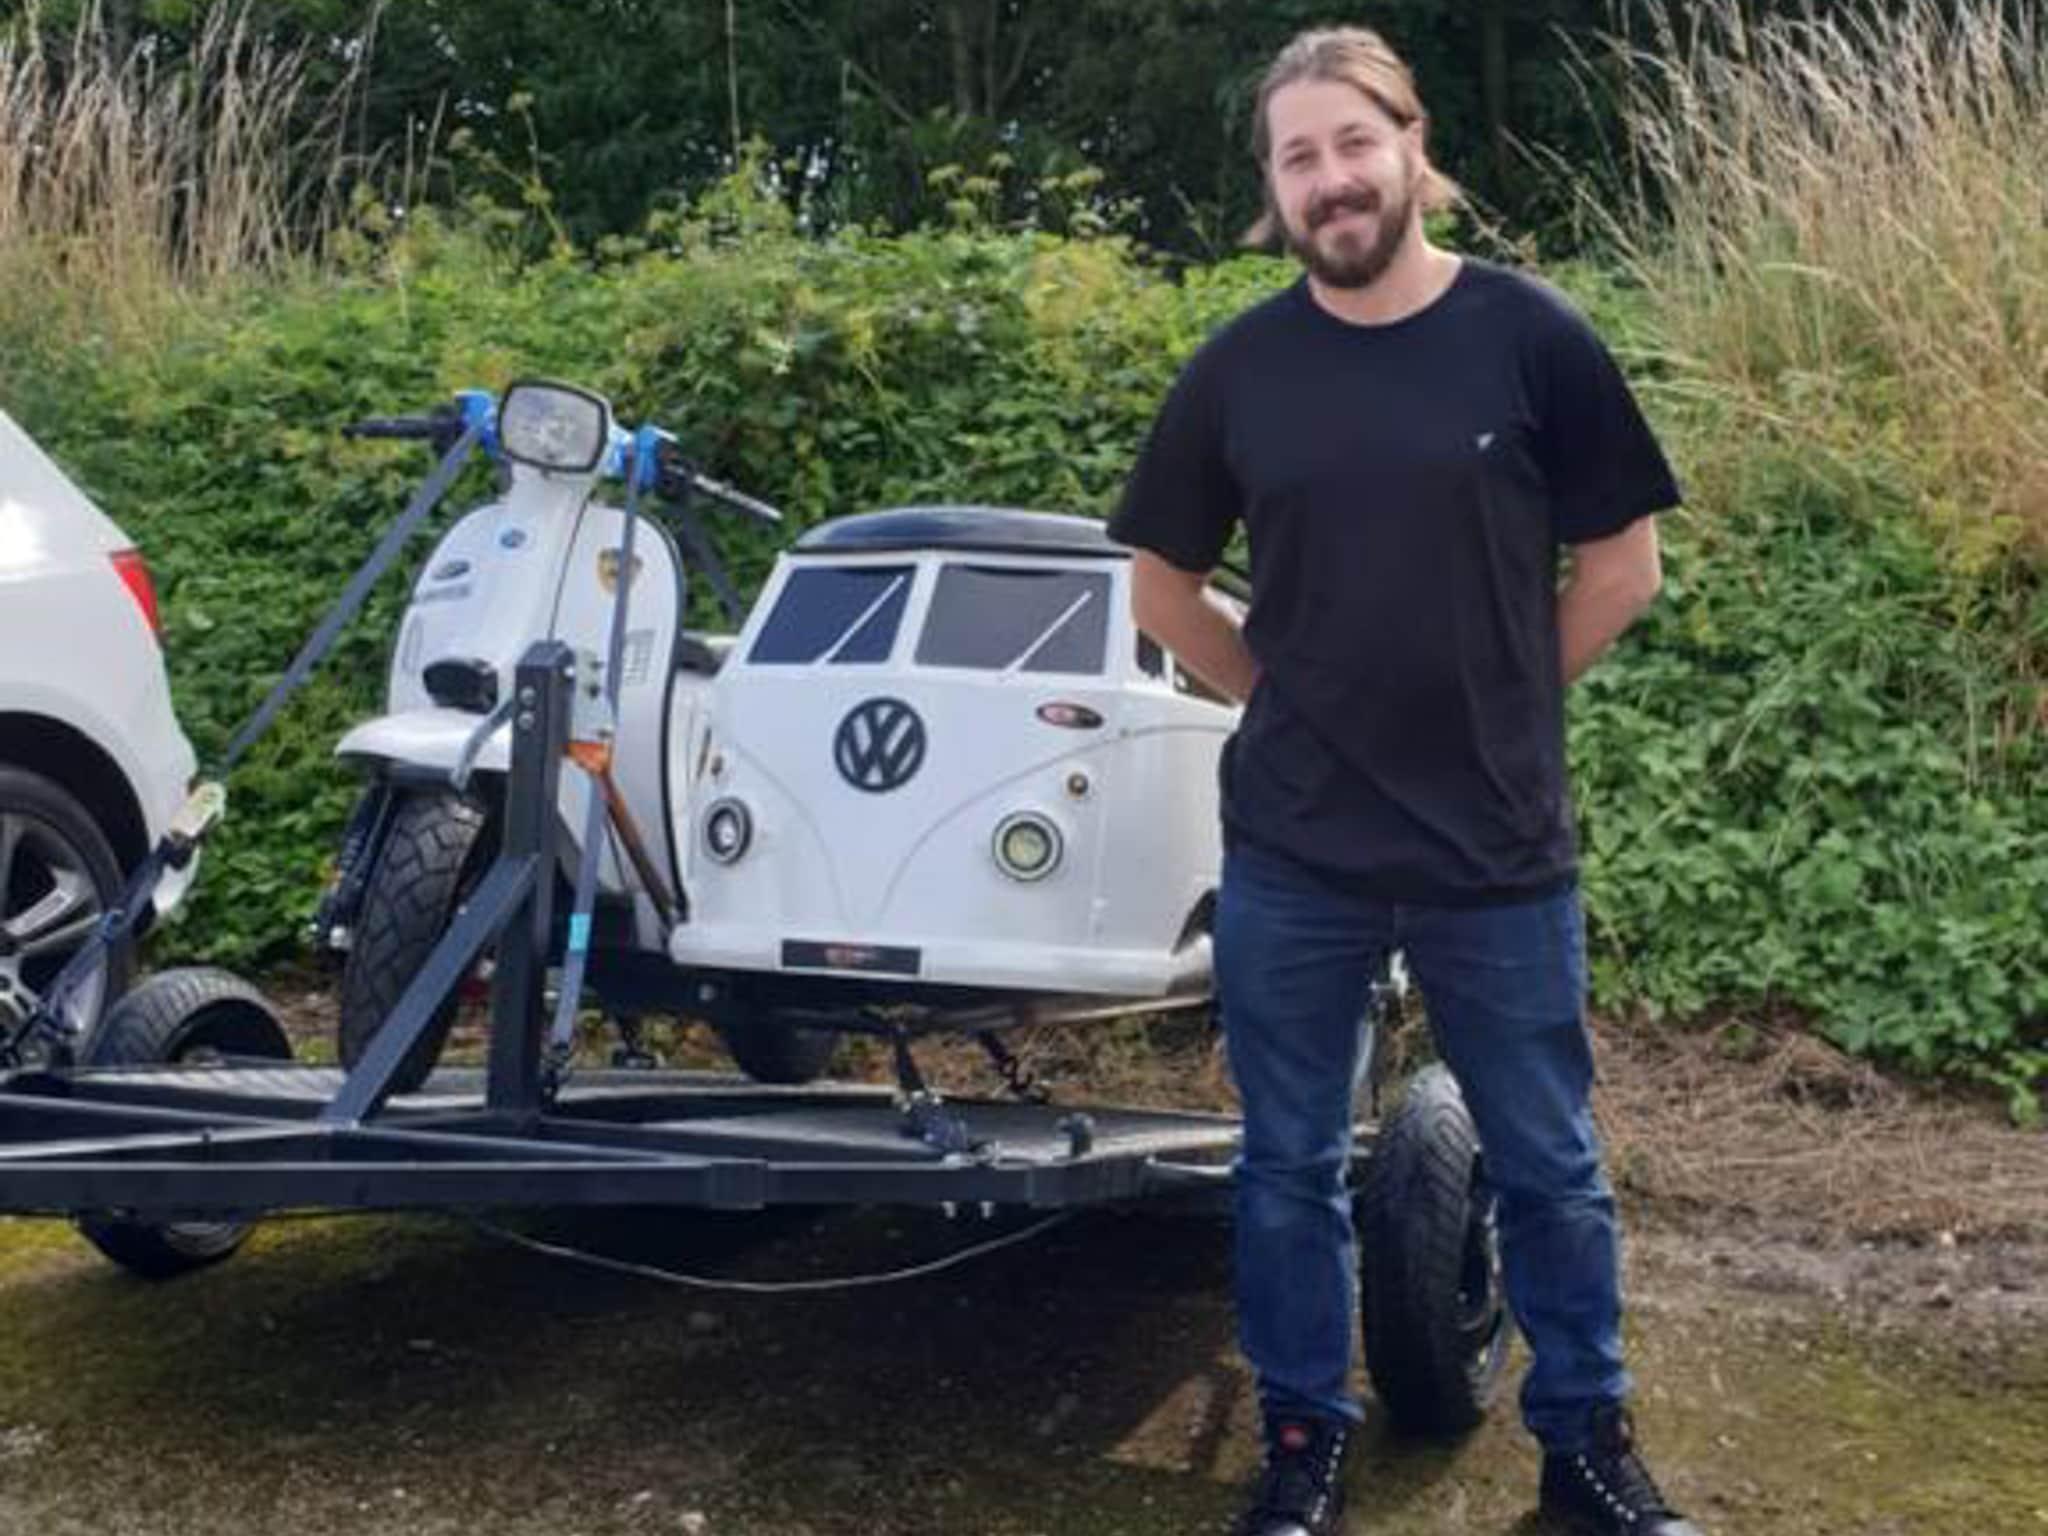 Winner James Gray of a Scomadi FP 200 and VW Splitscreen Sidecar with custom trailer - Bonkers!  2nd Aug